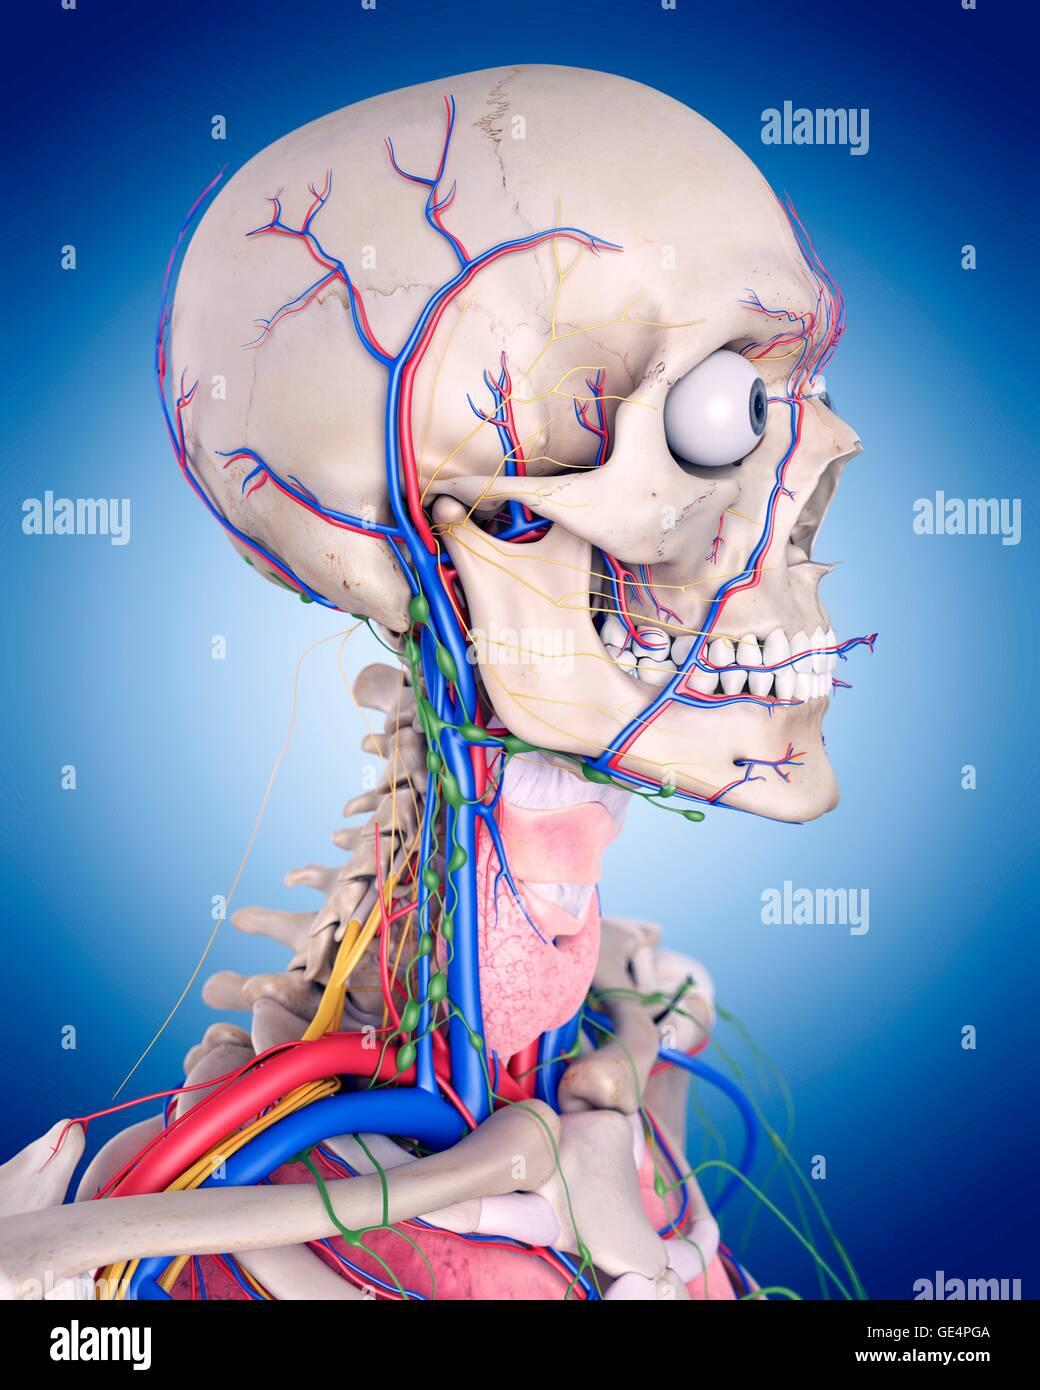 Kopf und Hals Anatomie, Abbildung Stockfoto, Bild: 111972906 - Alamy